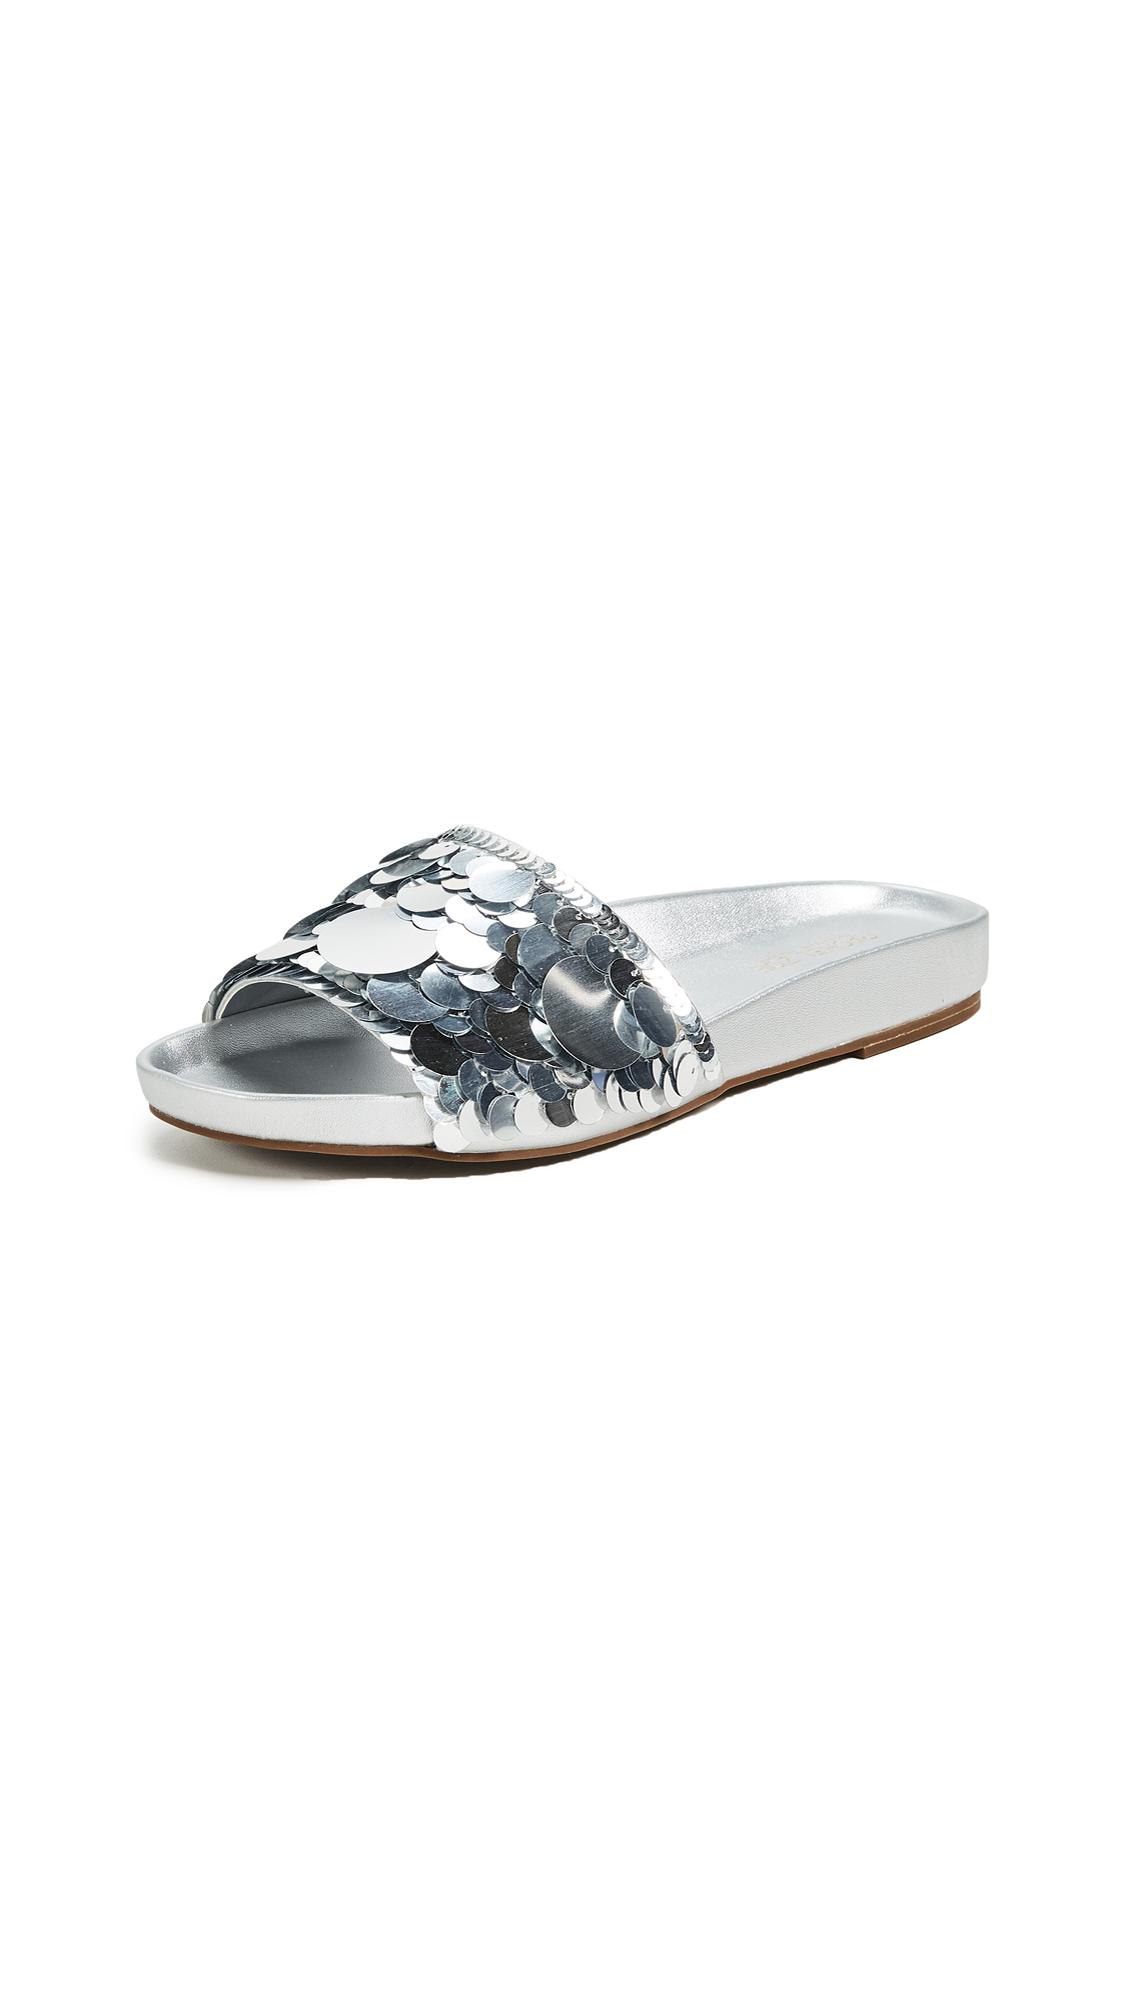 Rachel Zoe Stella Slides - Silver